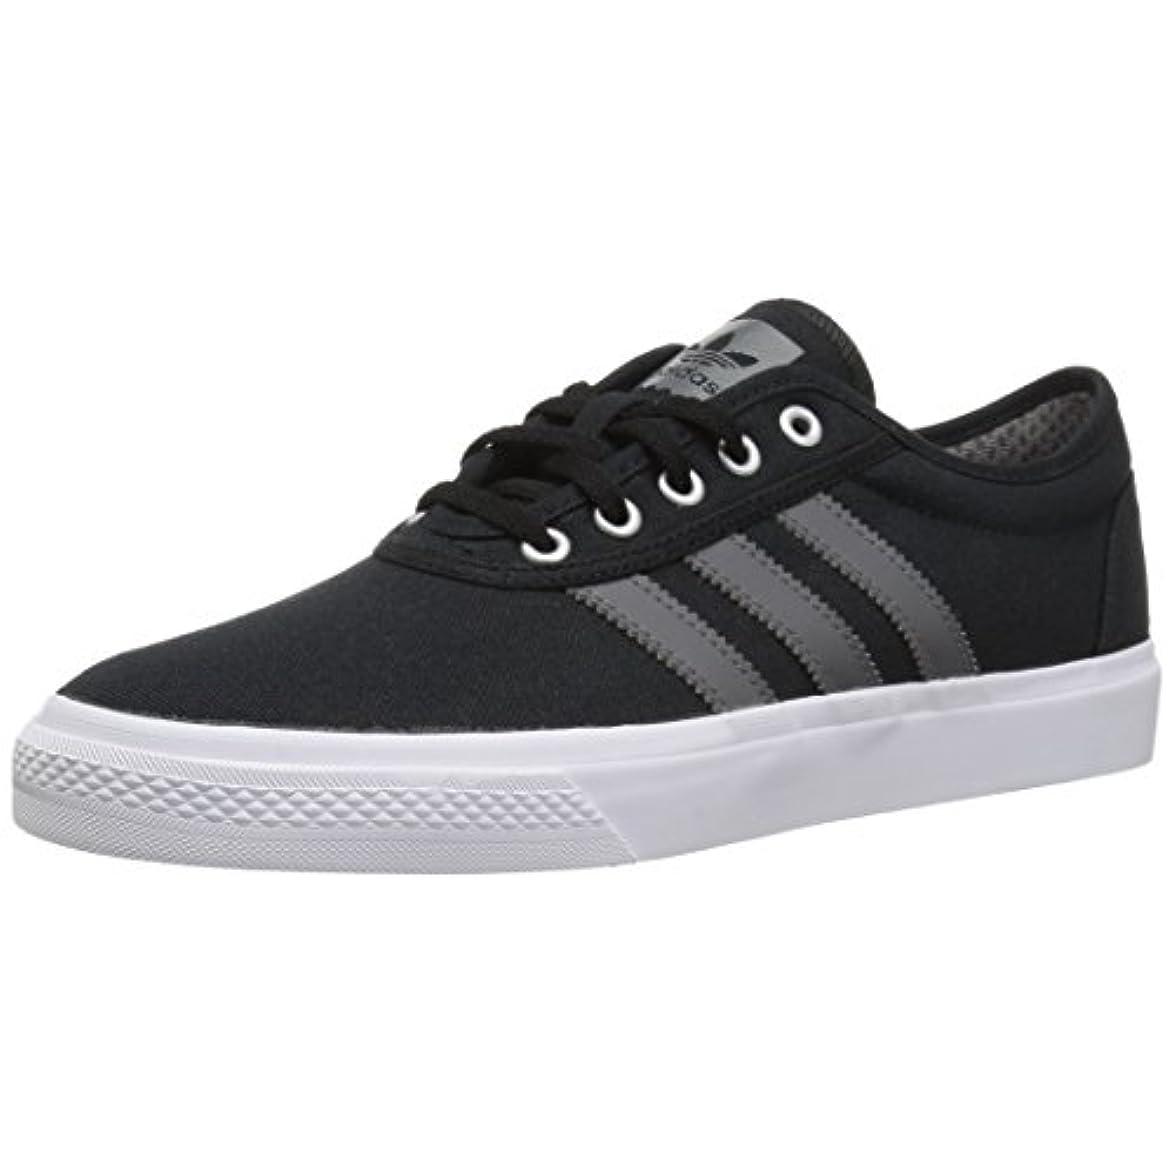 Adidas Originals Adi-ease Skate Shoe Black grey white 4 5 M Us